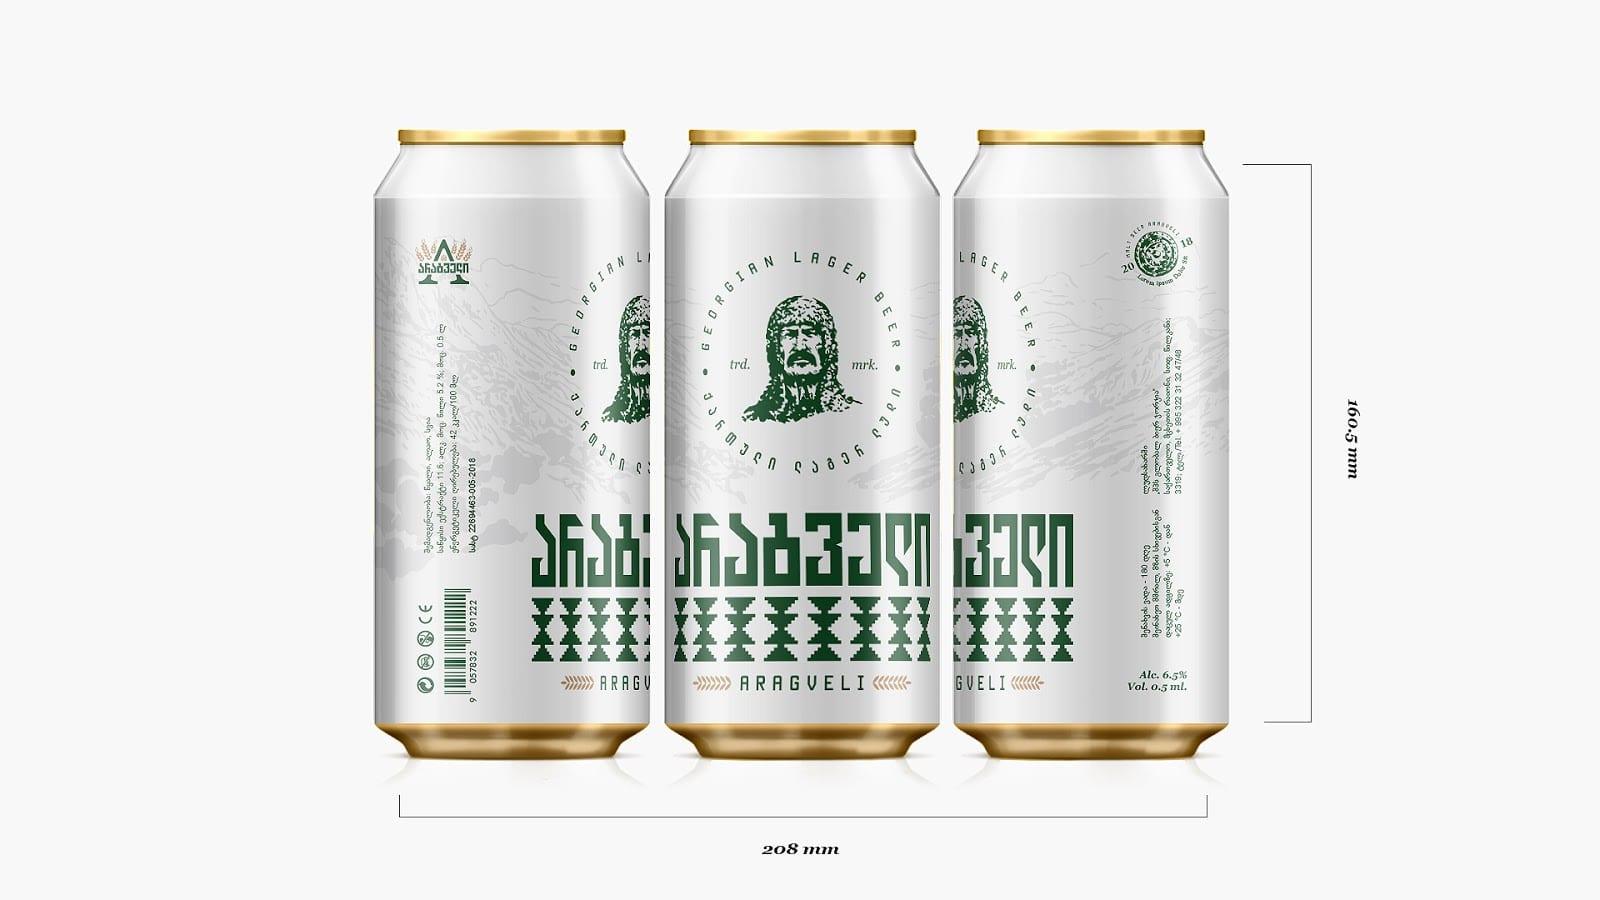 7 Simulation - Odvážná podoba piva Aragveli